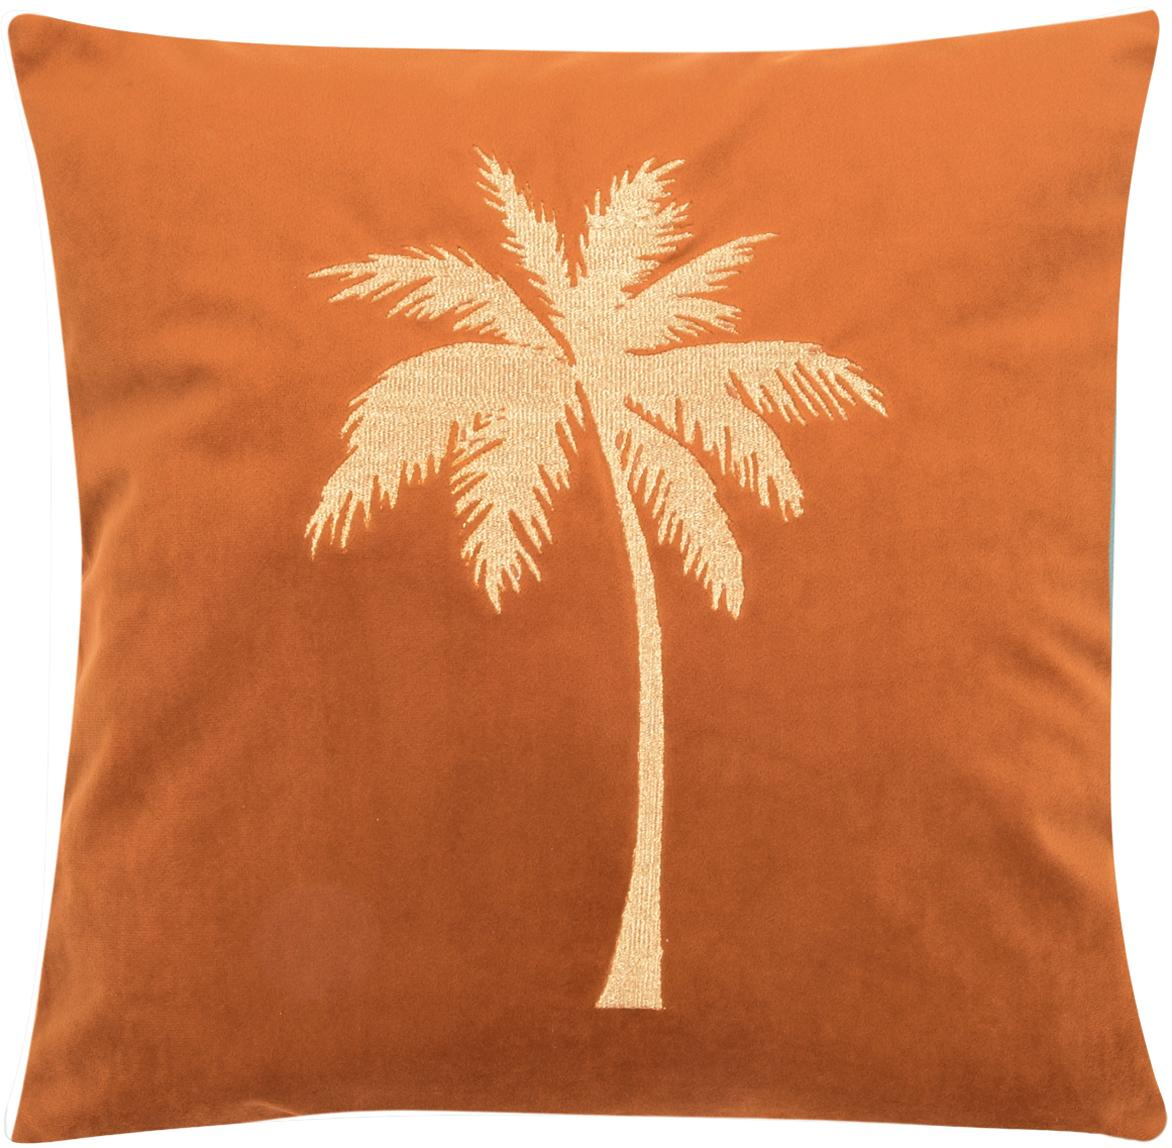 Funda de cojín bordada de terciopelo brillante Palmsprings, 100%terciopelo de poliéster, Naranja, dorado, An 40 x L 40 cm